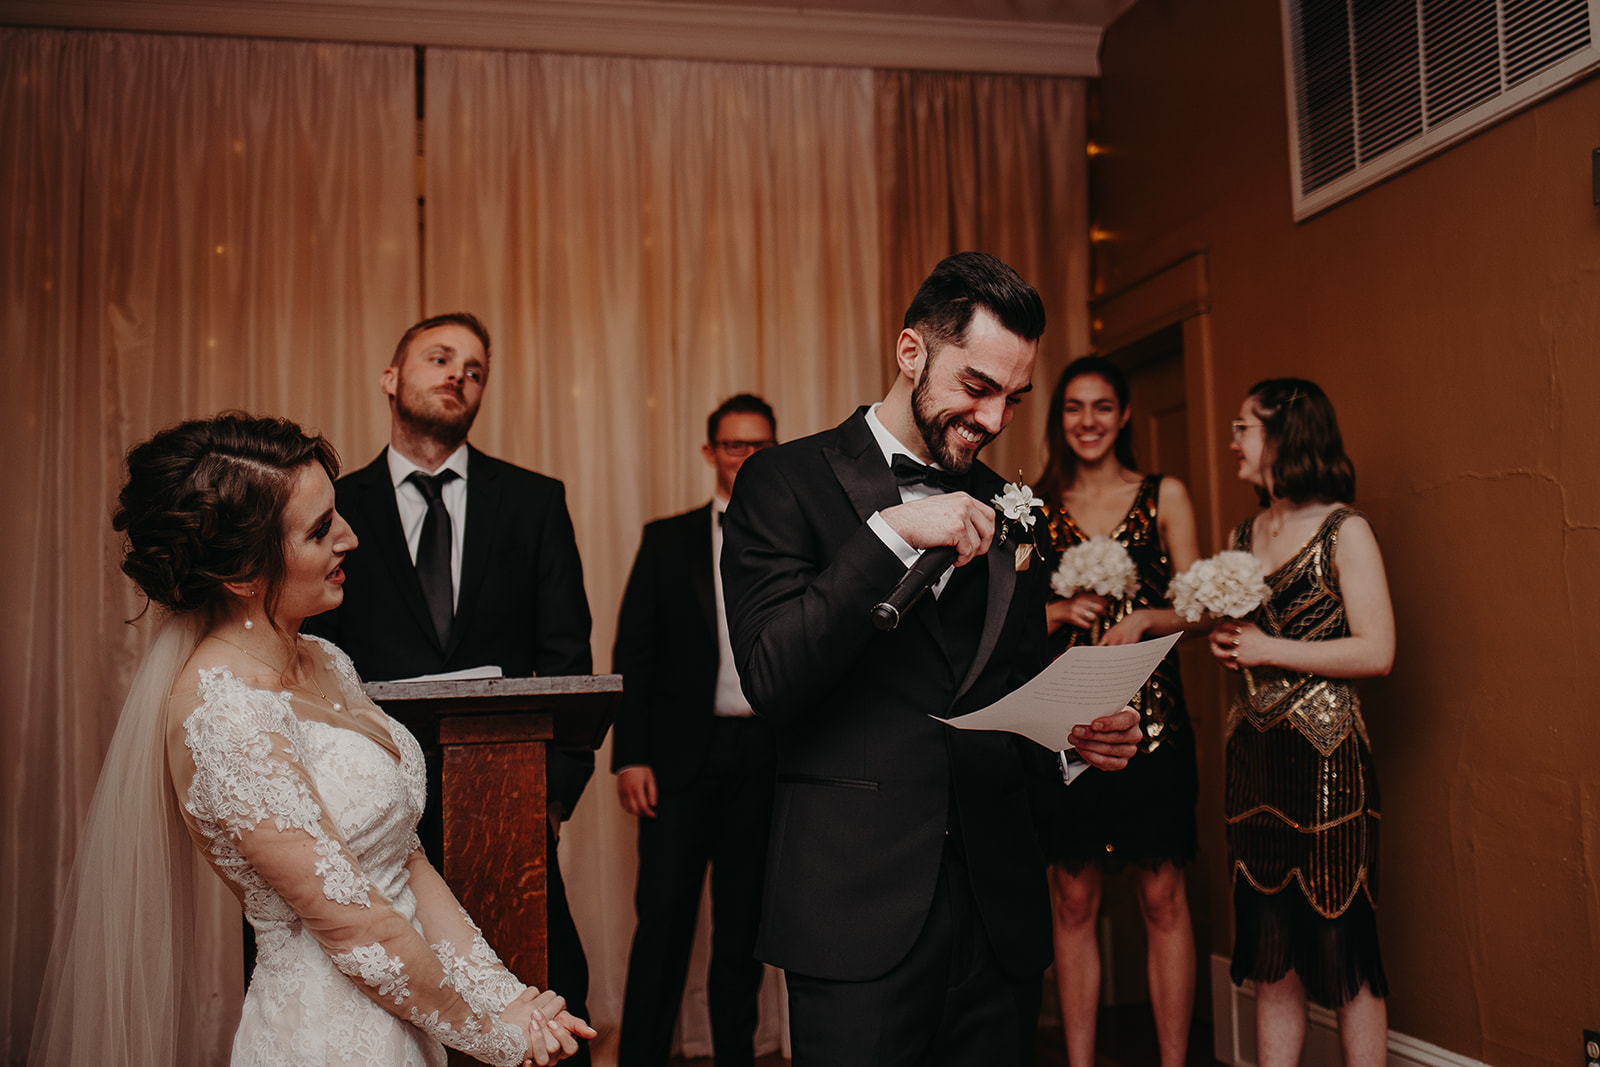 bellingham-wedding-broadway-hall-natalie-levi (116 of 143).jpg